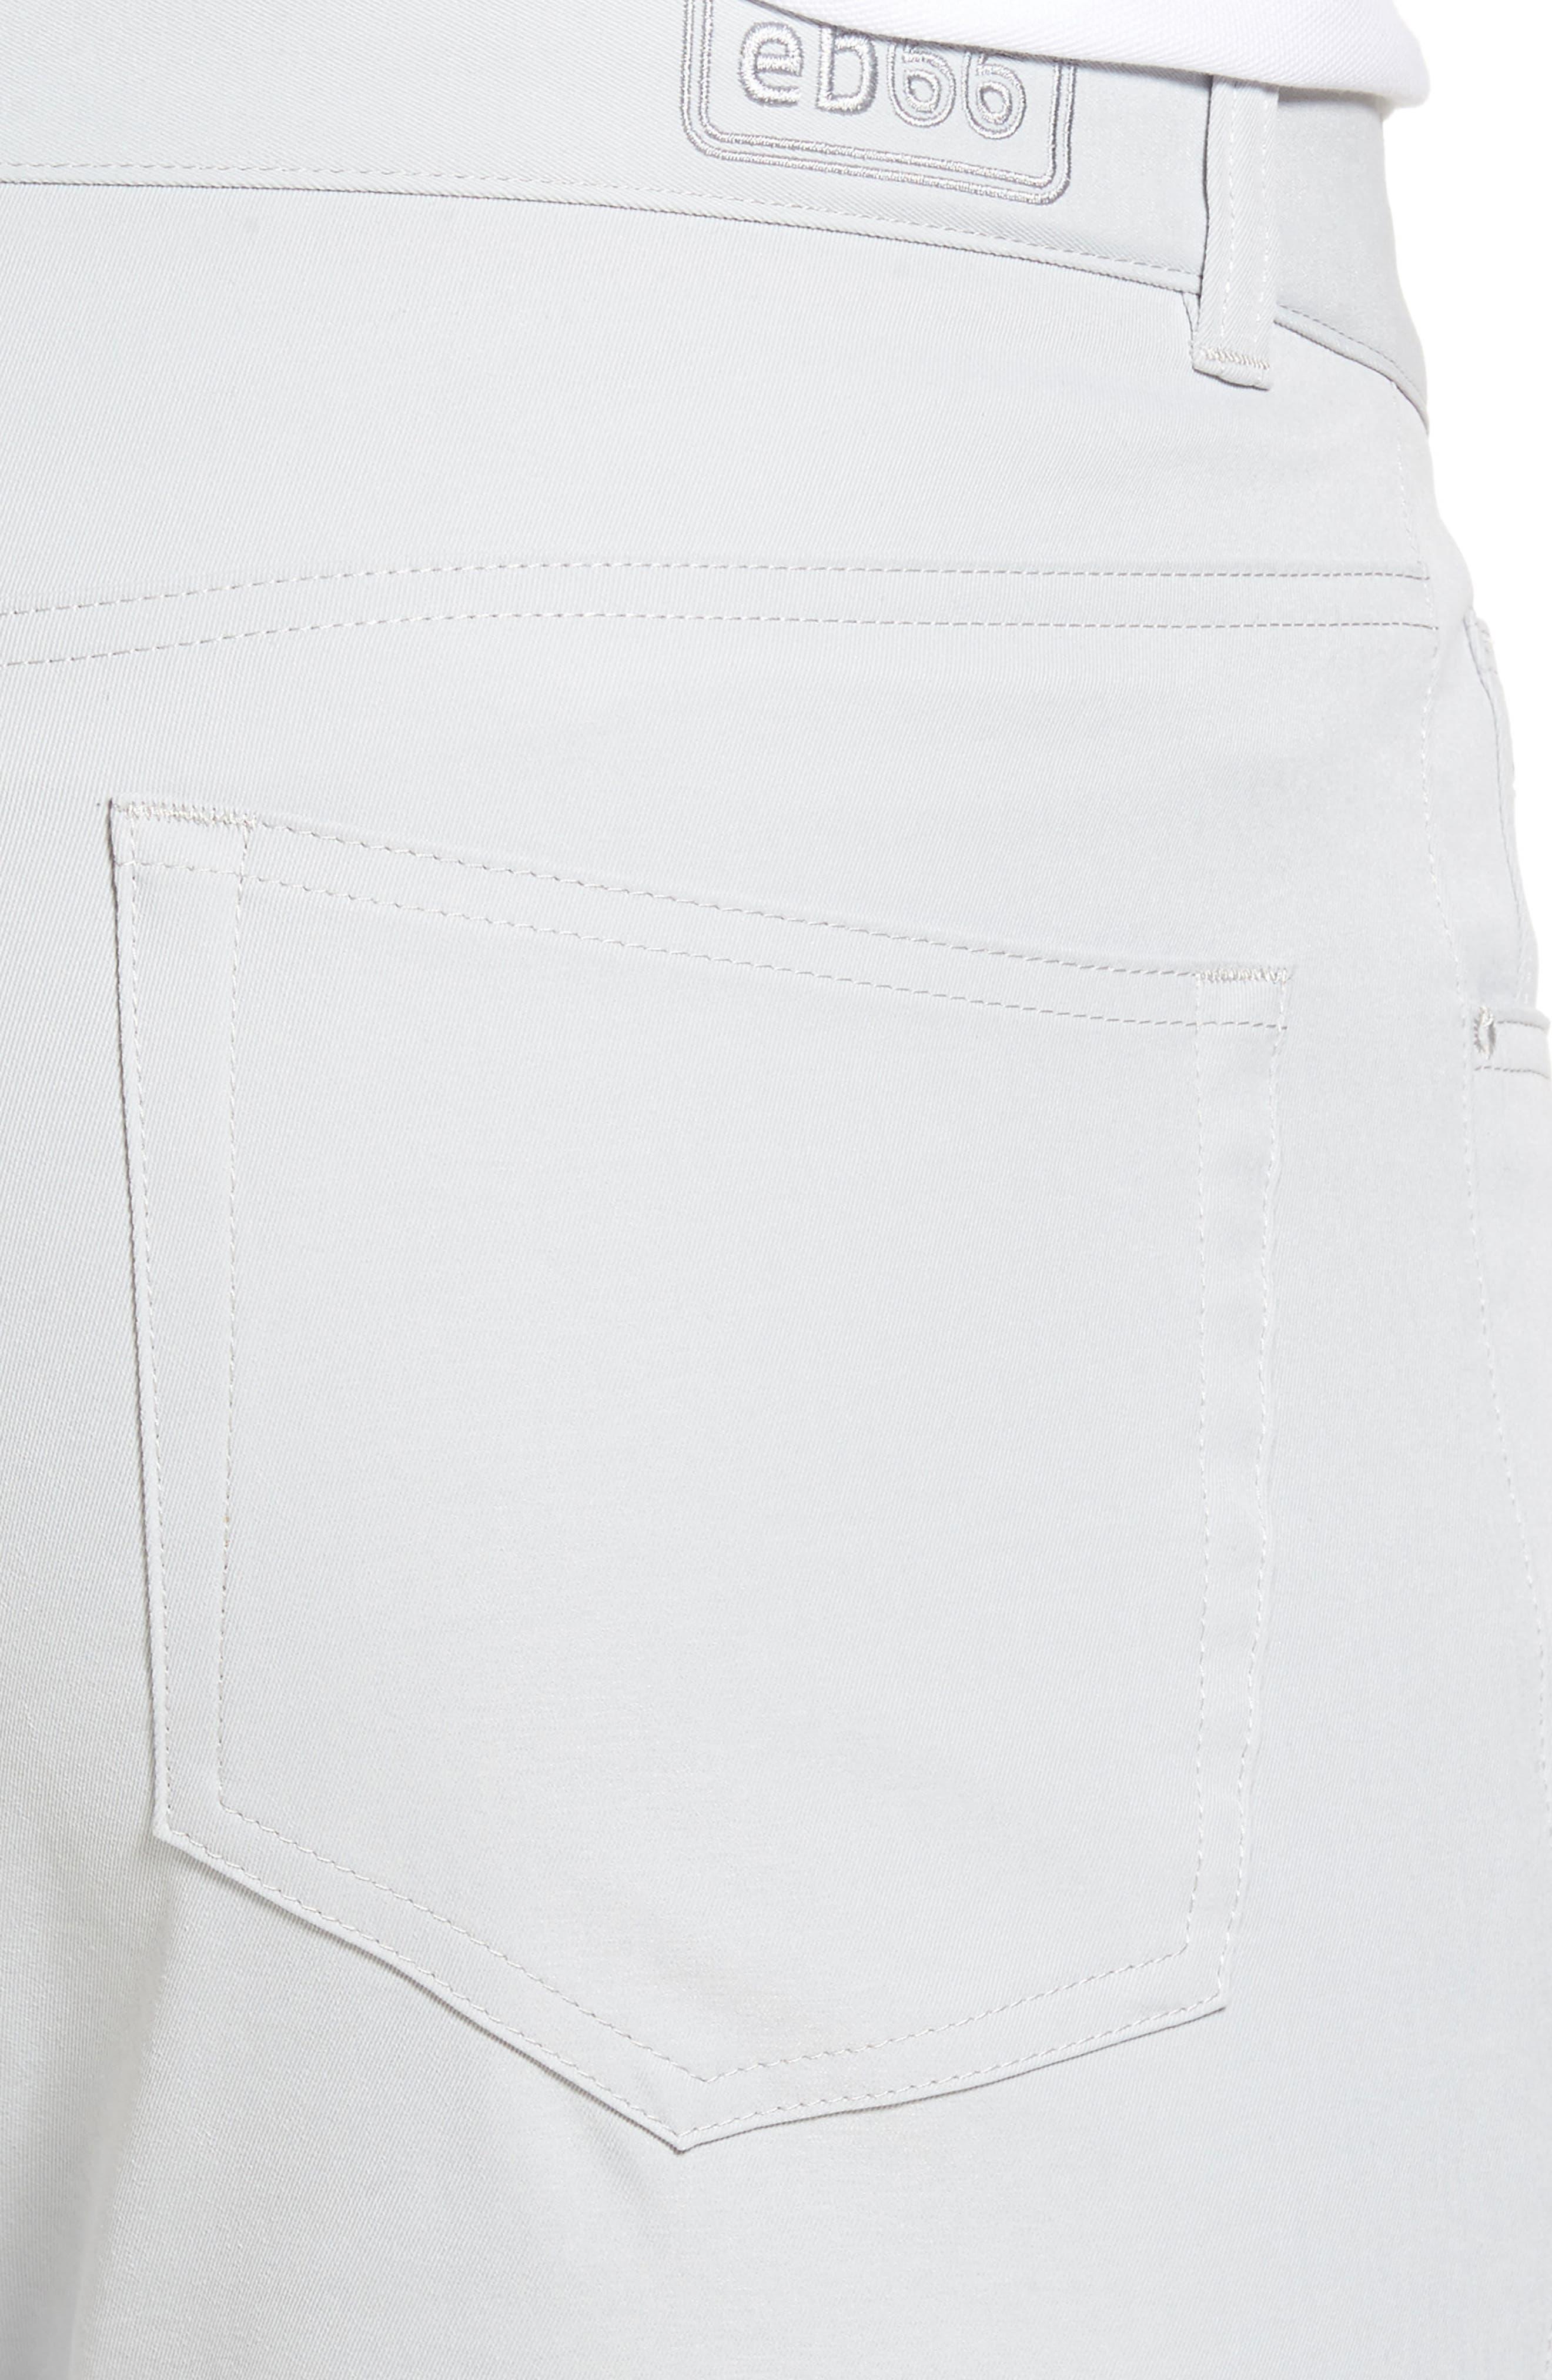 EB66 Performance Six-Pocket Pants,                             Alternate thumbnail 20, color,